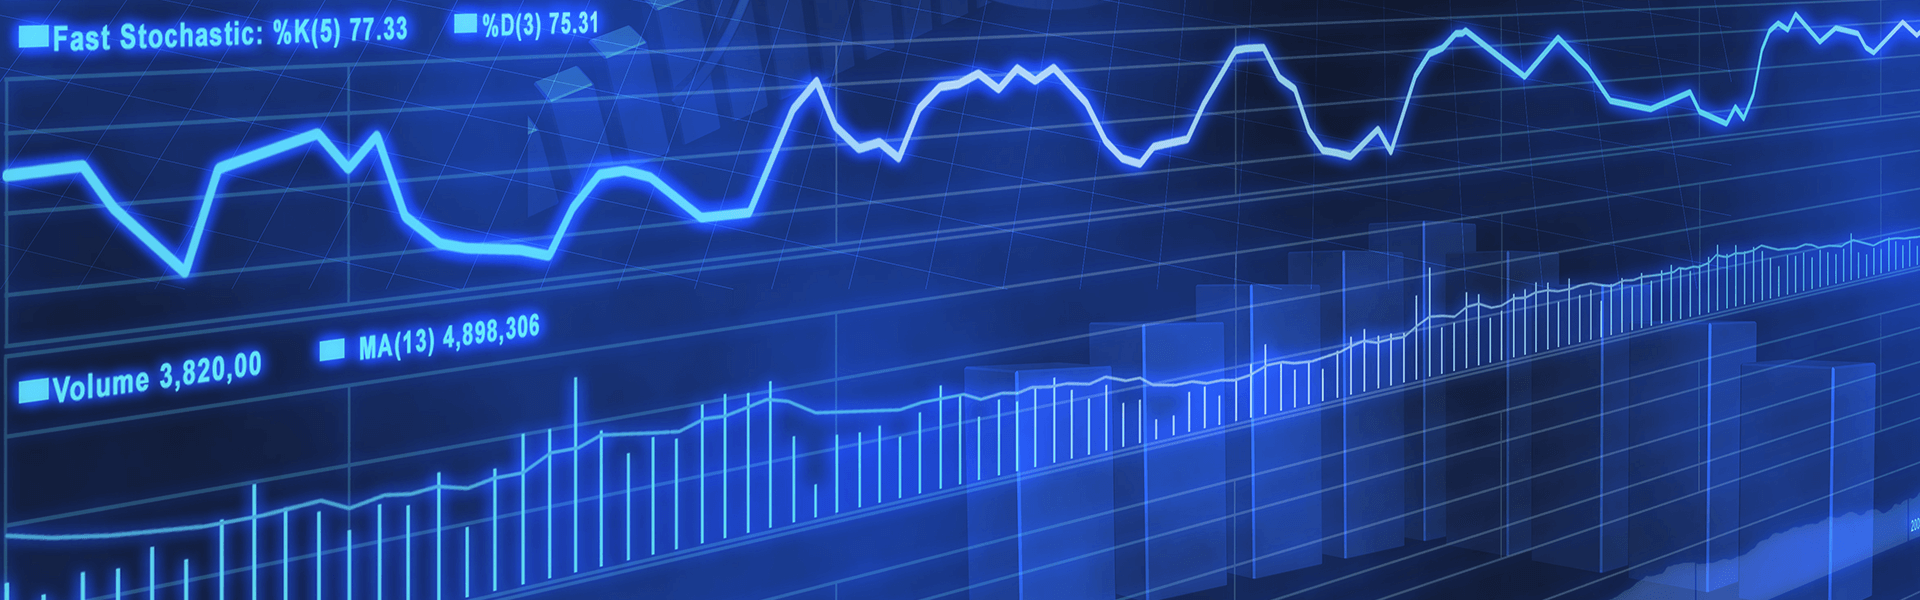 Stockmarket graph